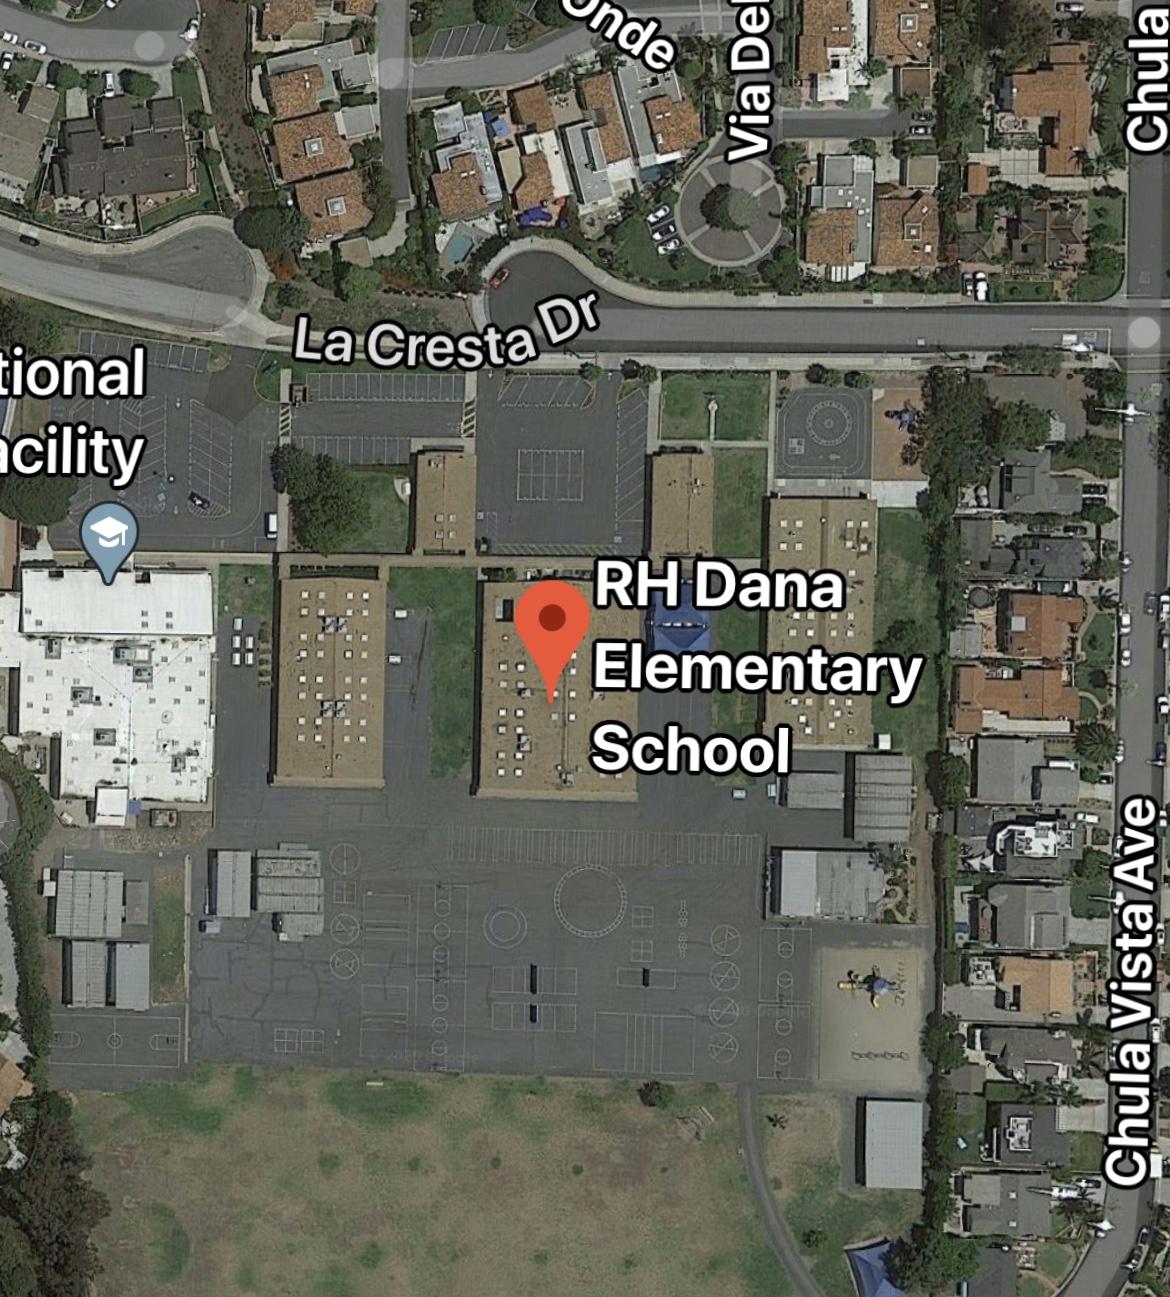 RH DANA ELEMENTARY SCHOOL